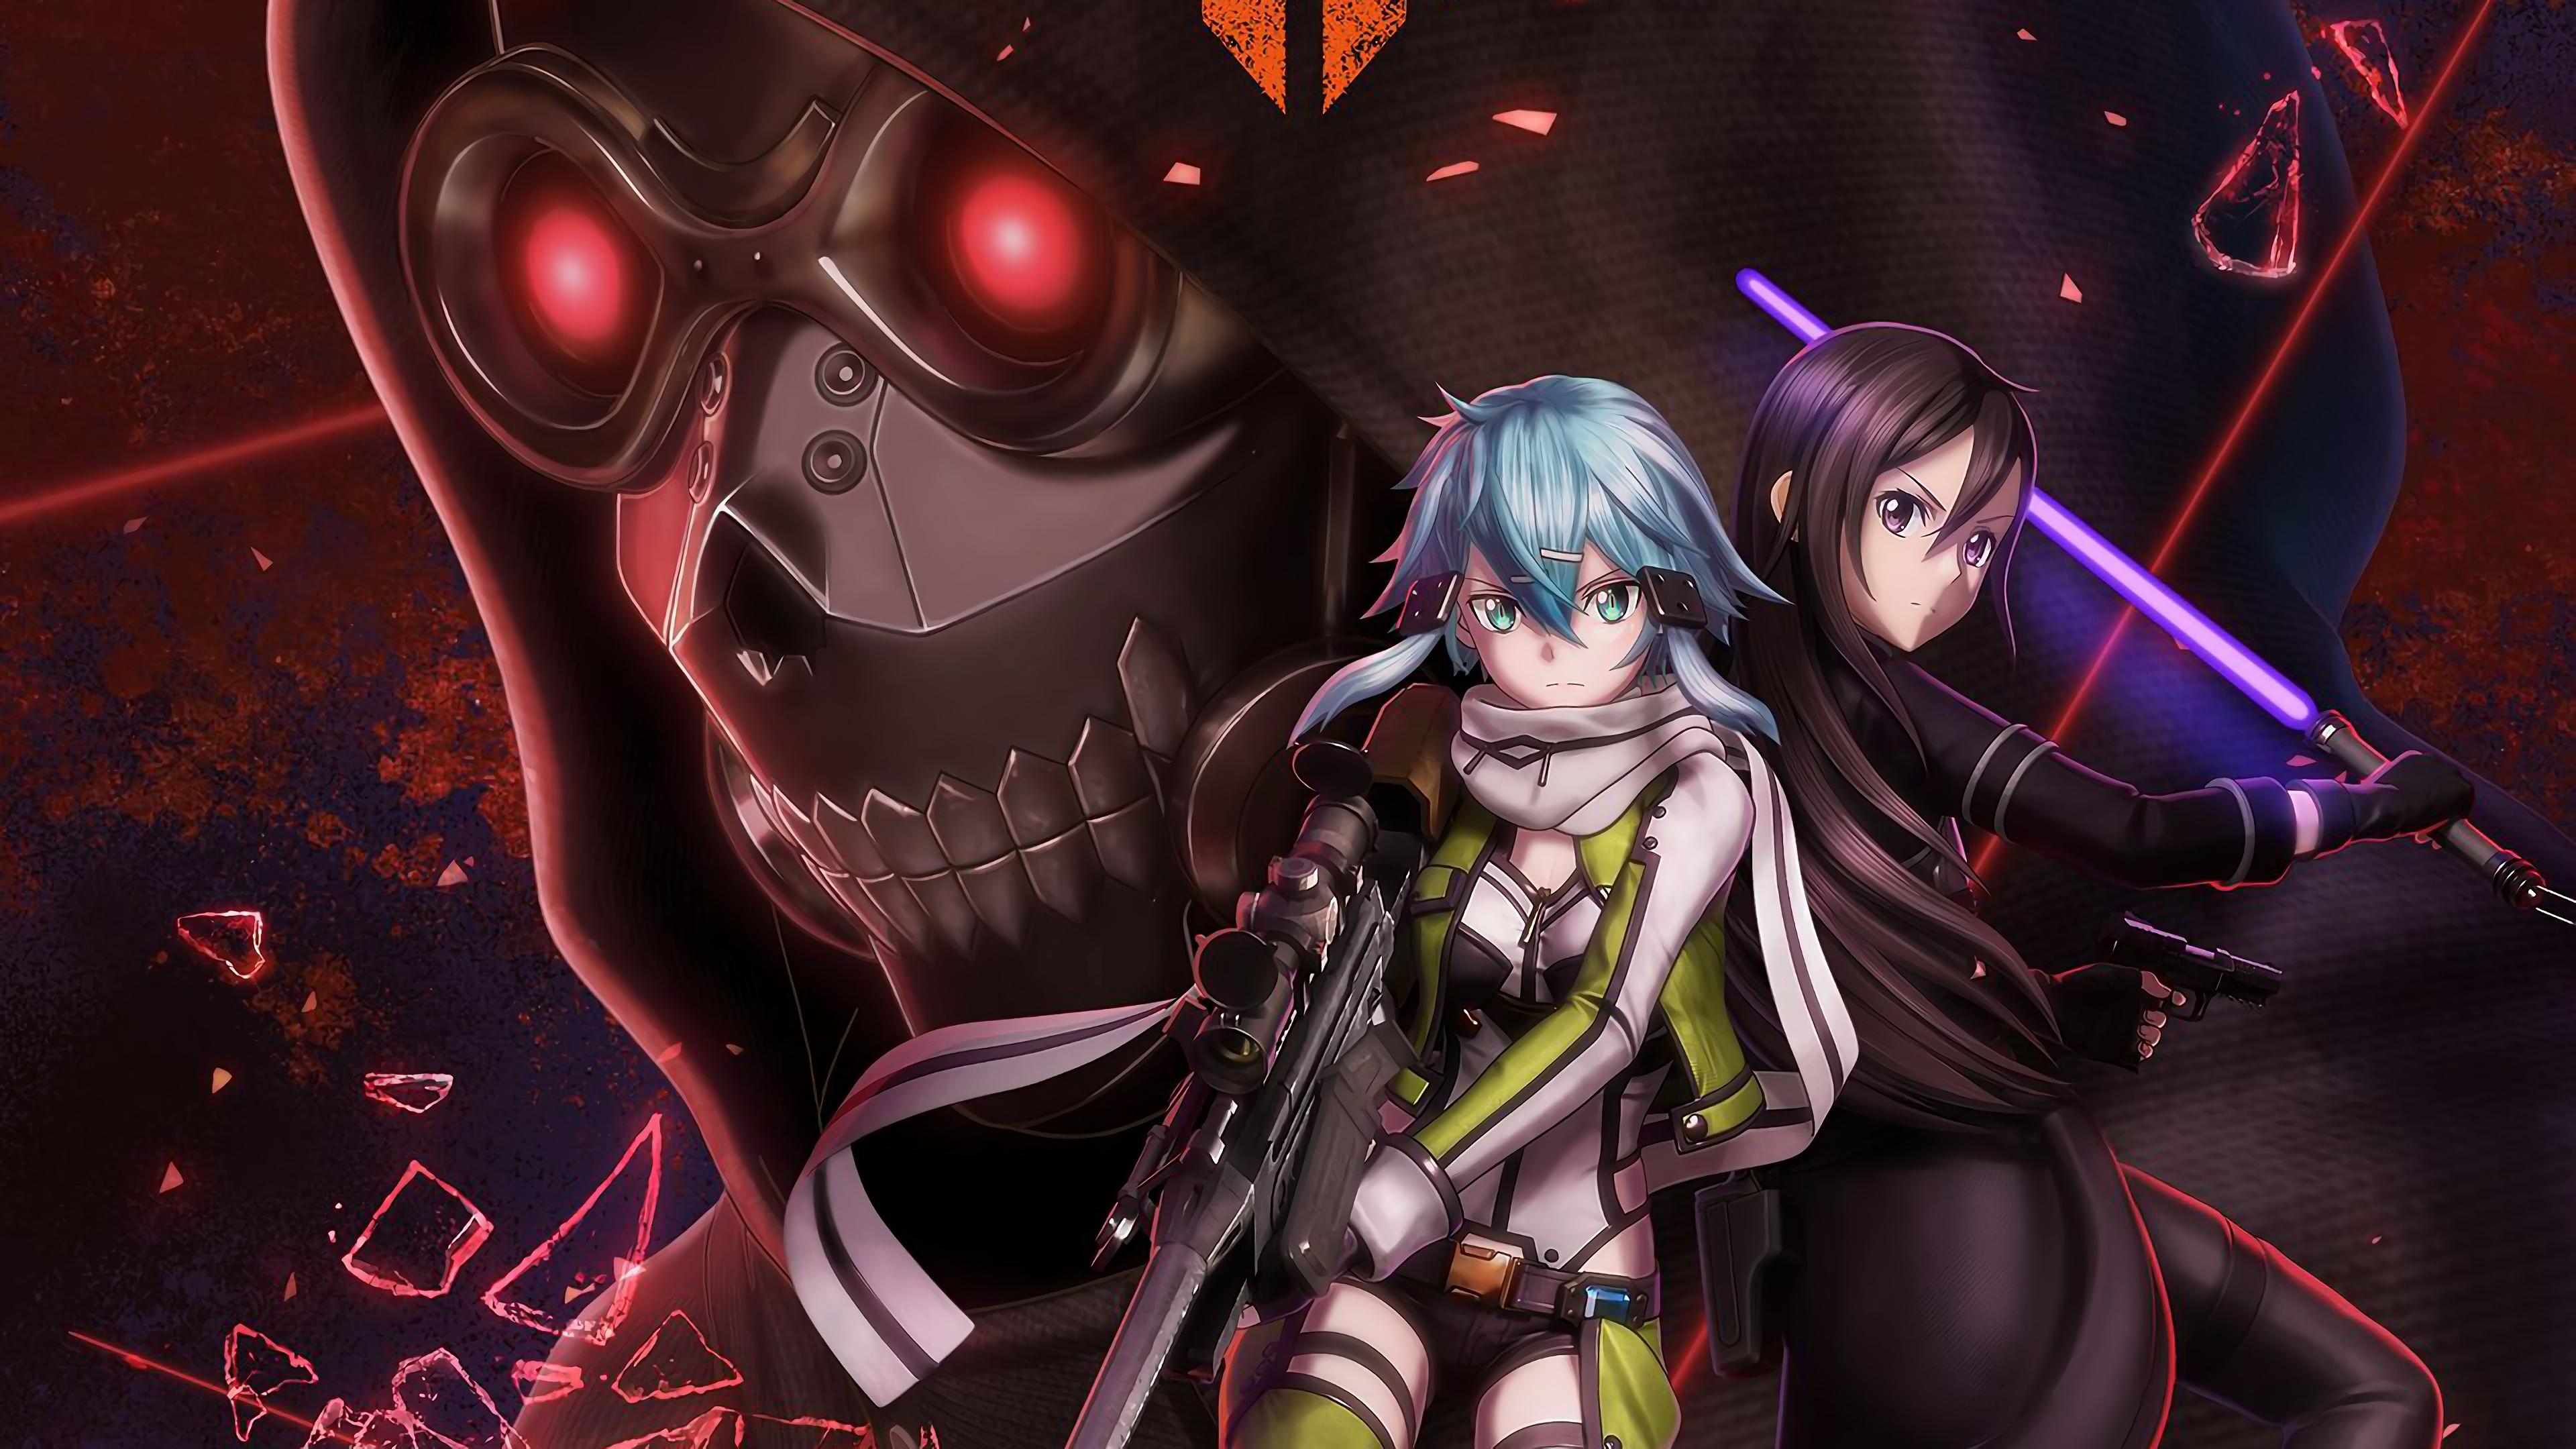 Sword Art Online Ii 4k Ultra Hd Wallpaper Hintergrund